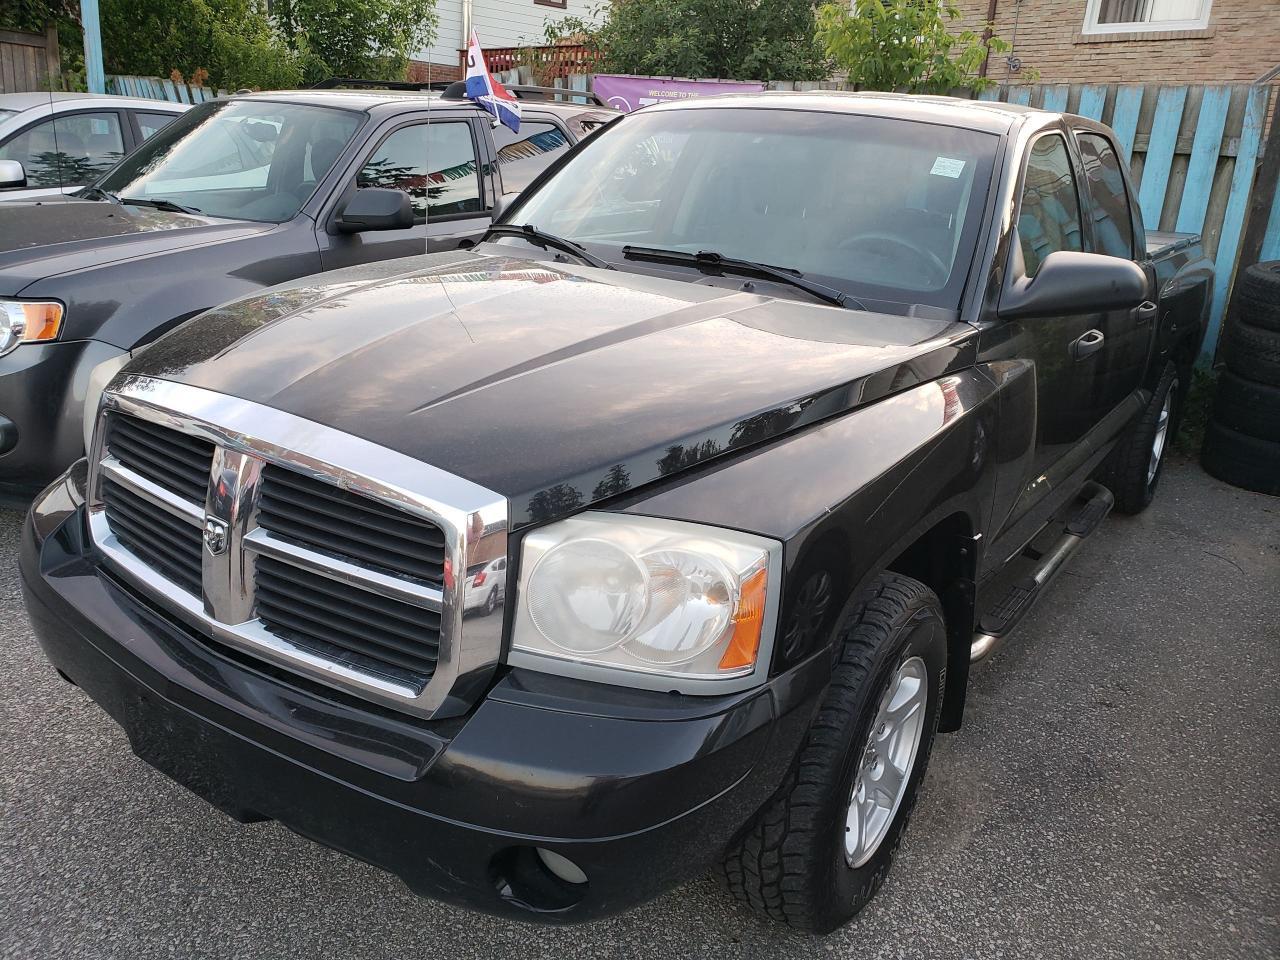 2006 Dodge Dakota CHECK IT OUT! Extra Clean/4x4/Runs Excellent